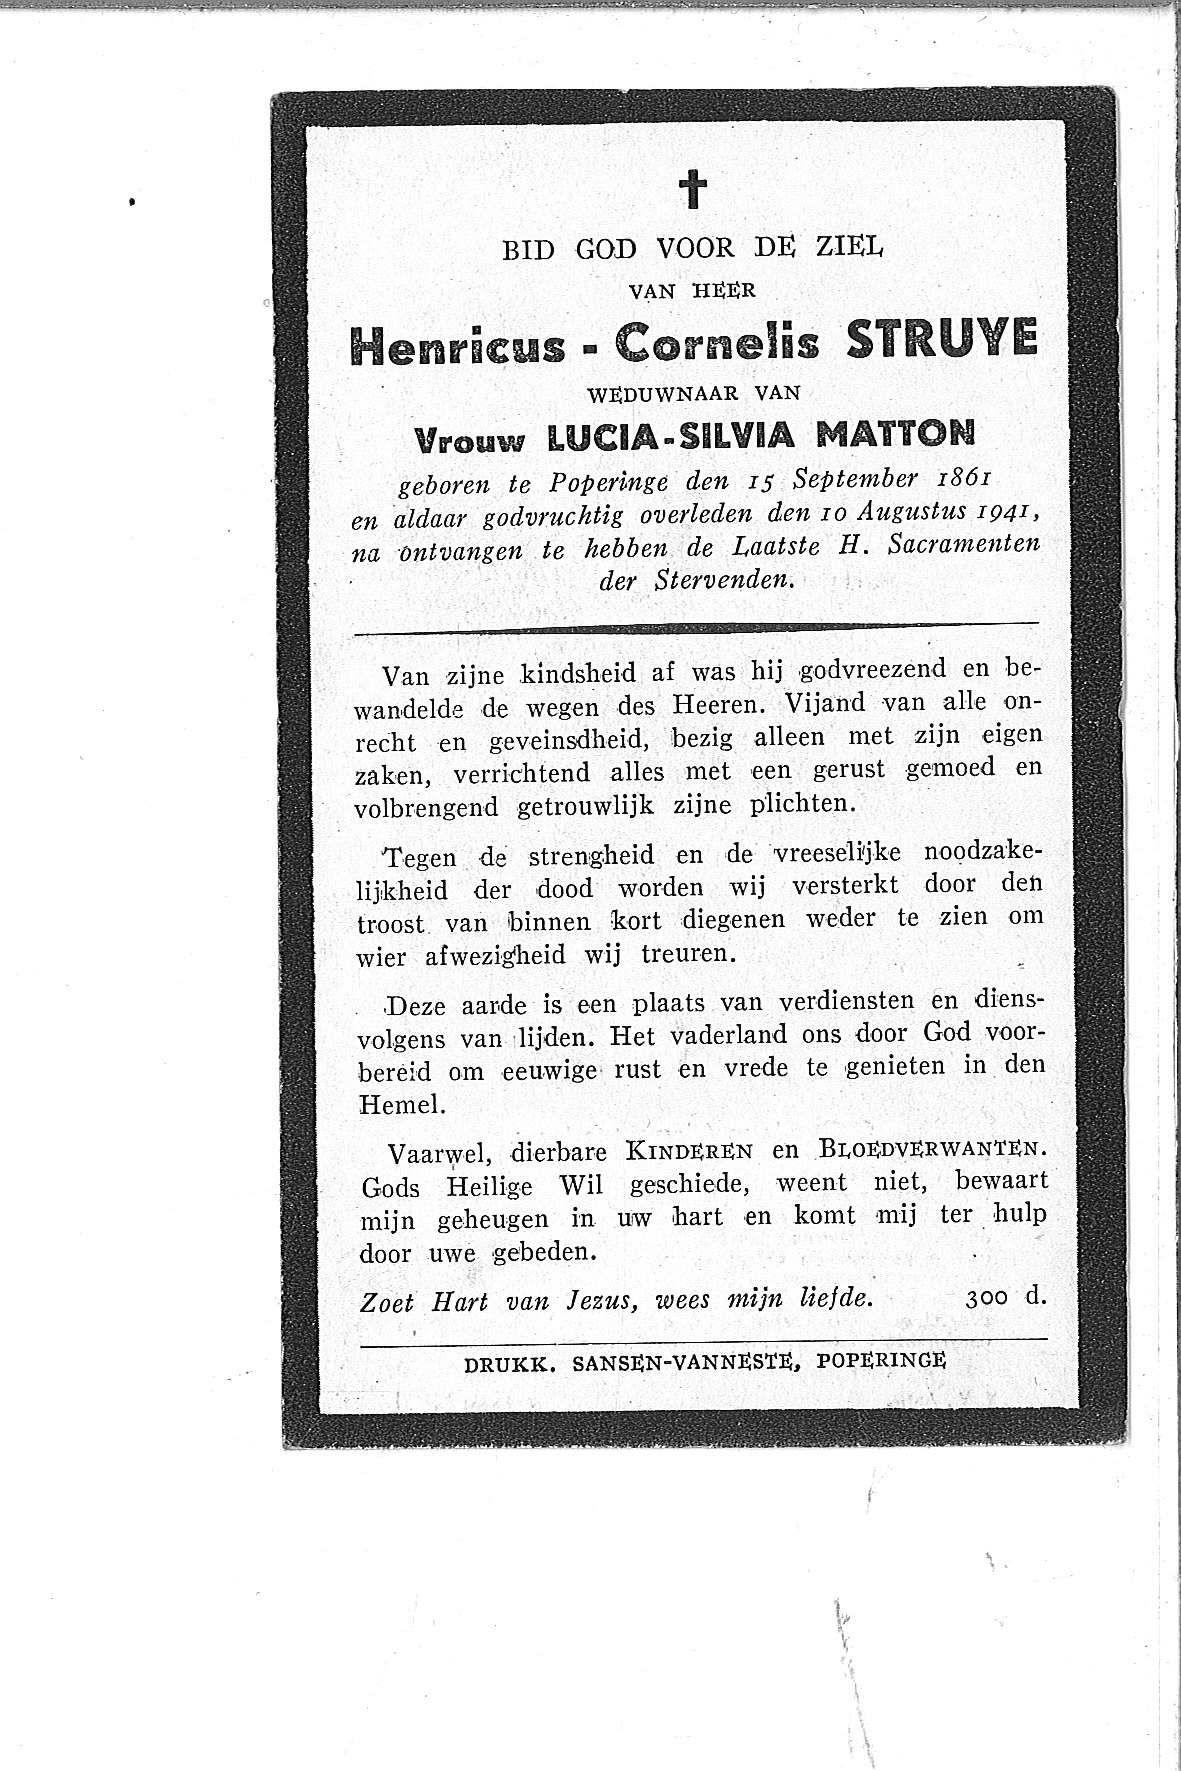 Henricus-Cornelis(1941)20131018105654_00028.jpg